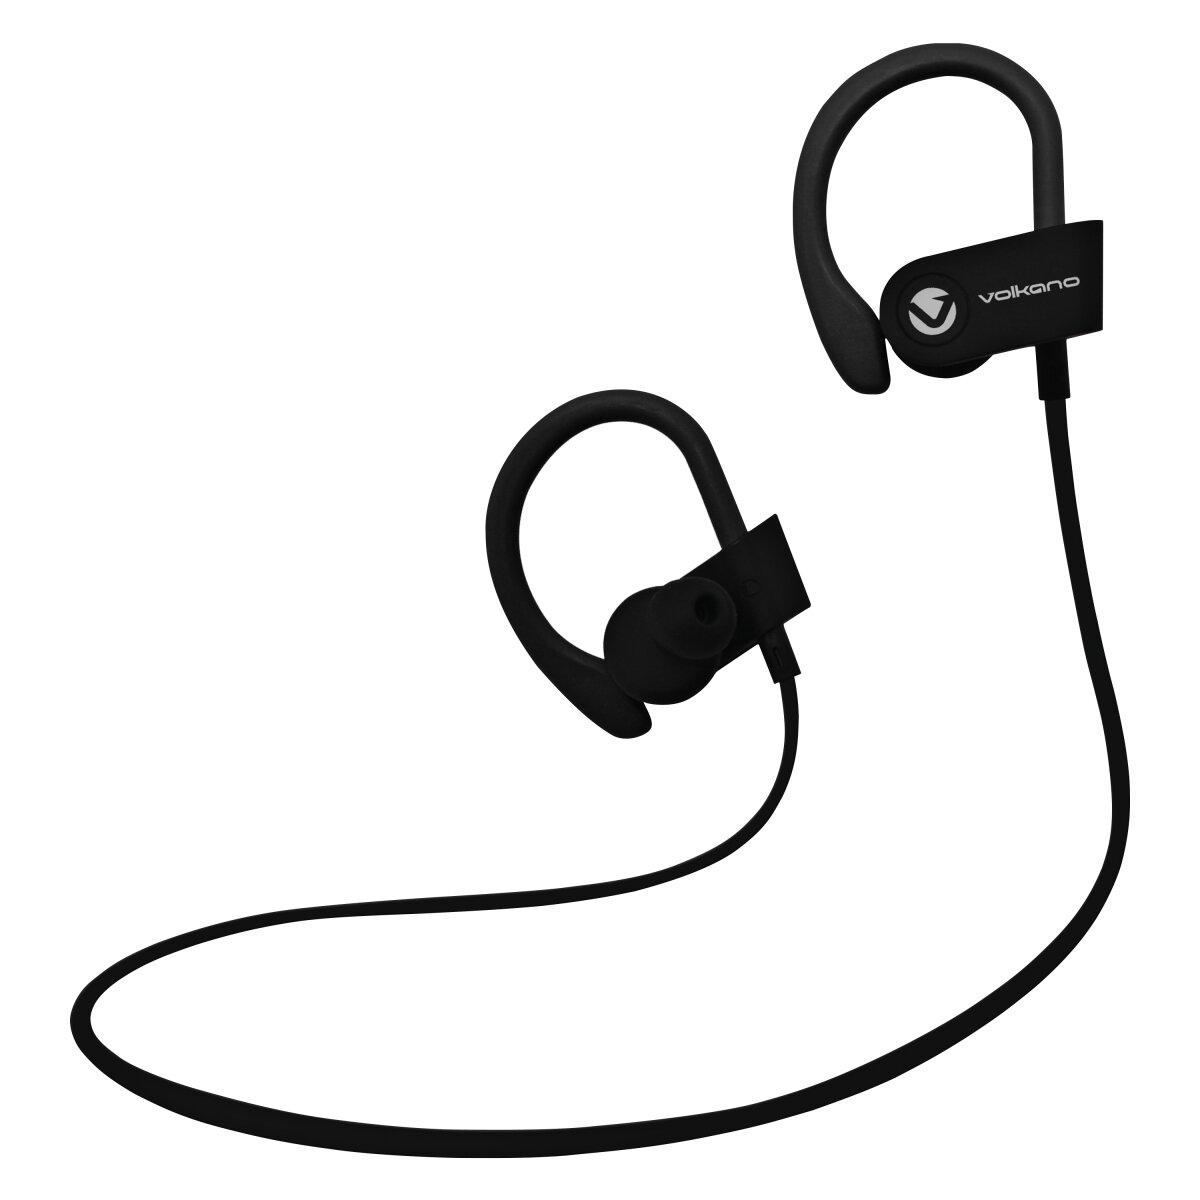 Volkano Race series Bluetooth Sport earhook earphones - black